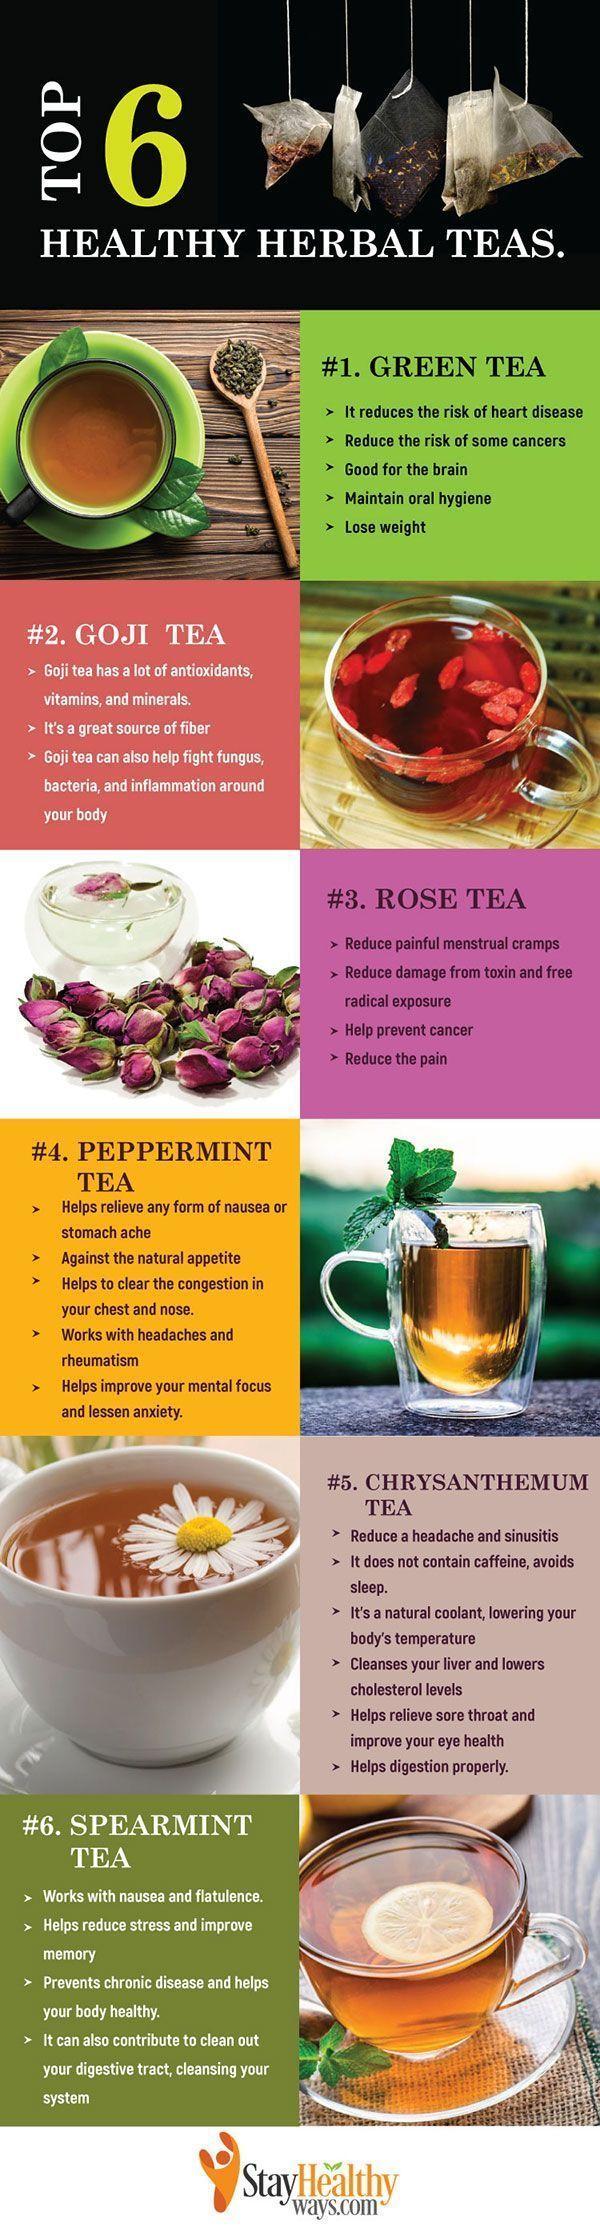 All You Need to Know About the Top 6 Healthy Teas: Green Tea, Goji Tea, Rose Tea, Peppermint Tea, Chrysanthemum Tea, Spearmint Tea